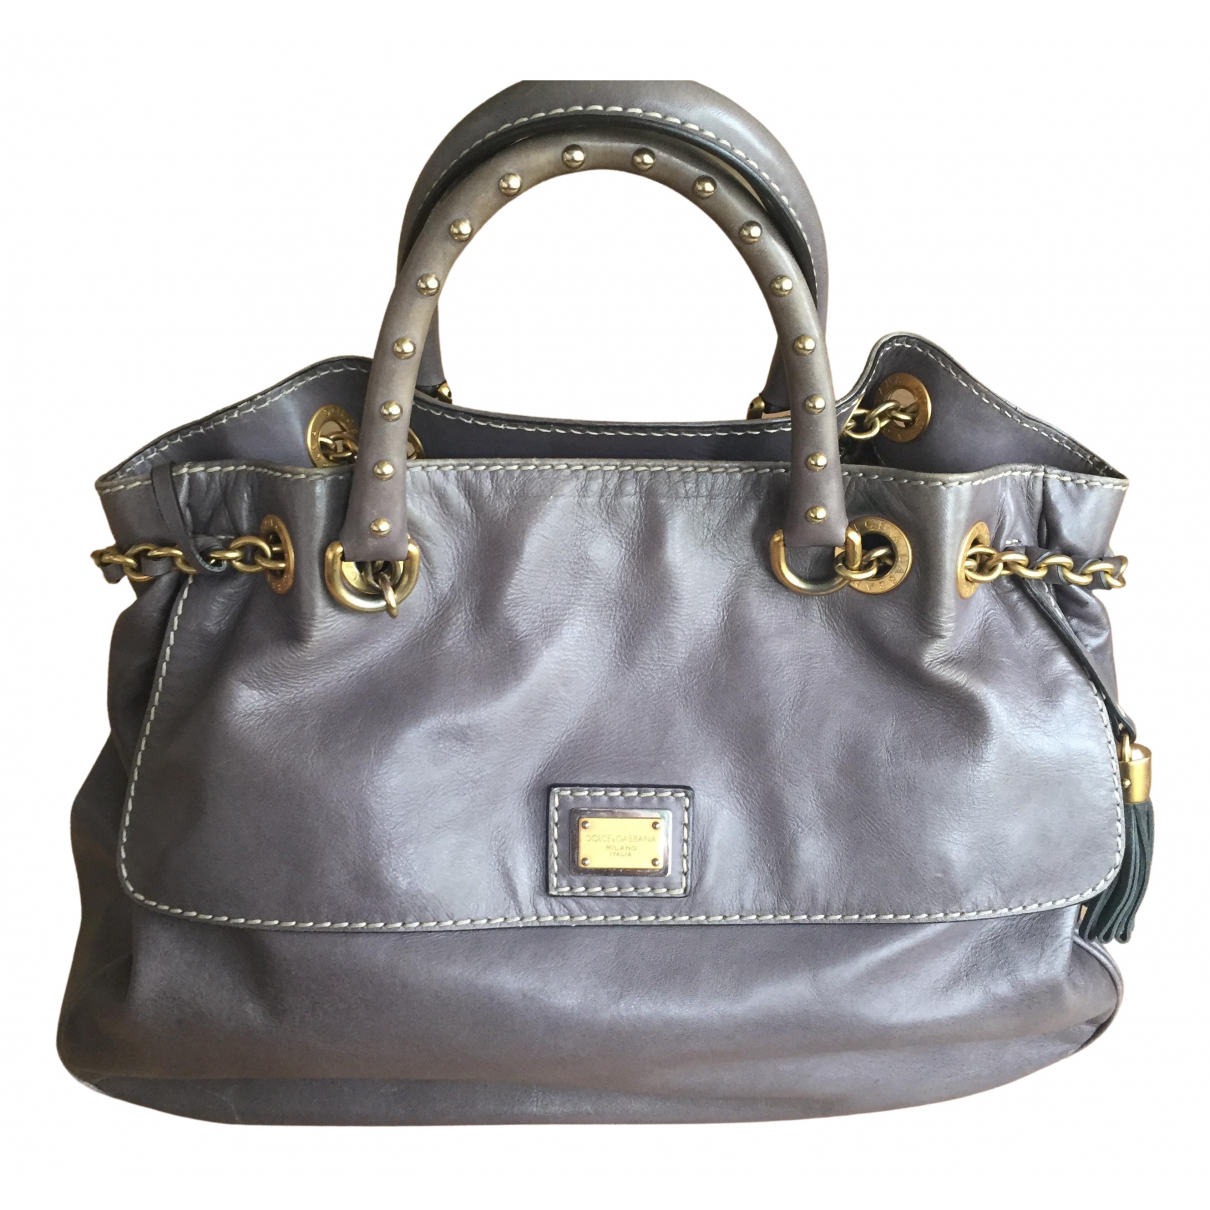 Dolce & Gabbana \N Anthracite Leather handbag for Women \N